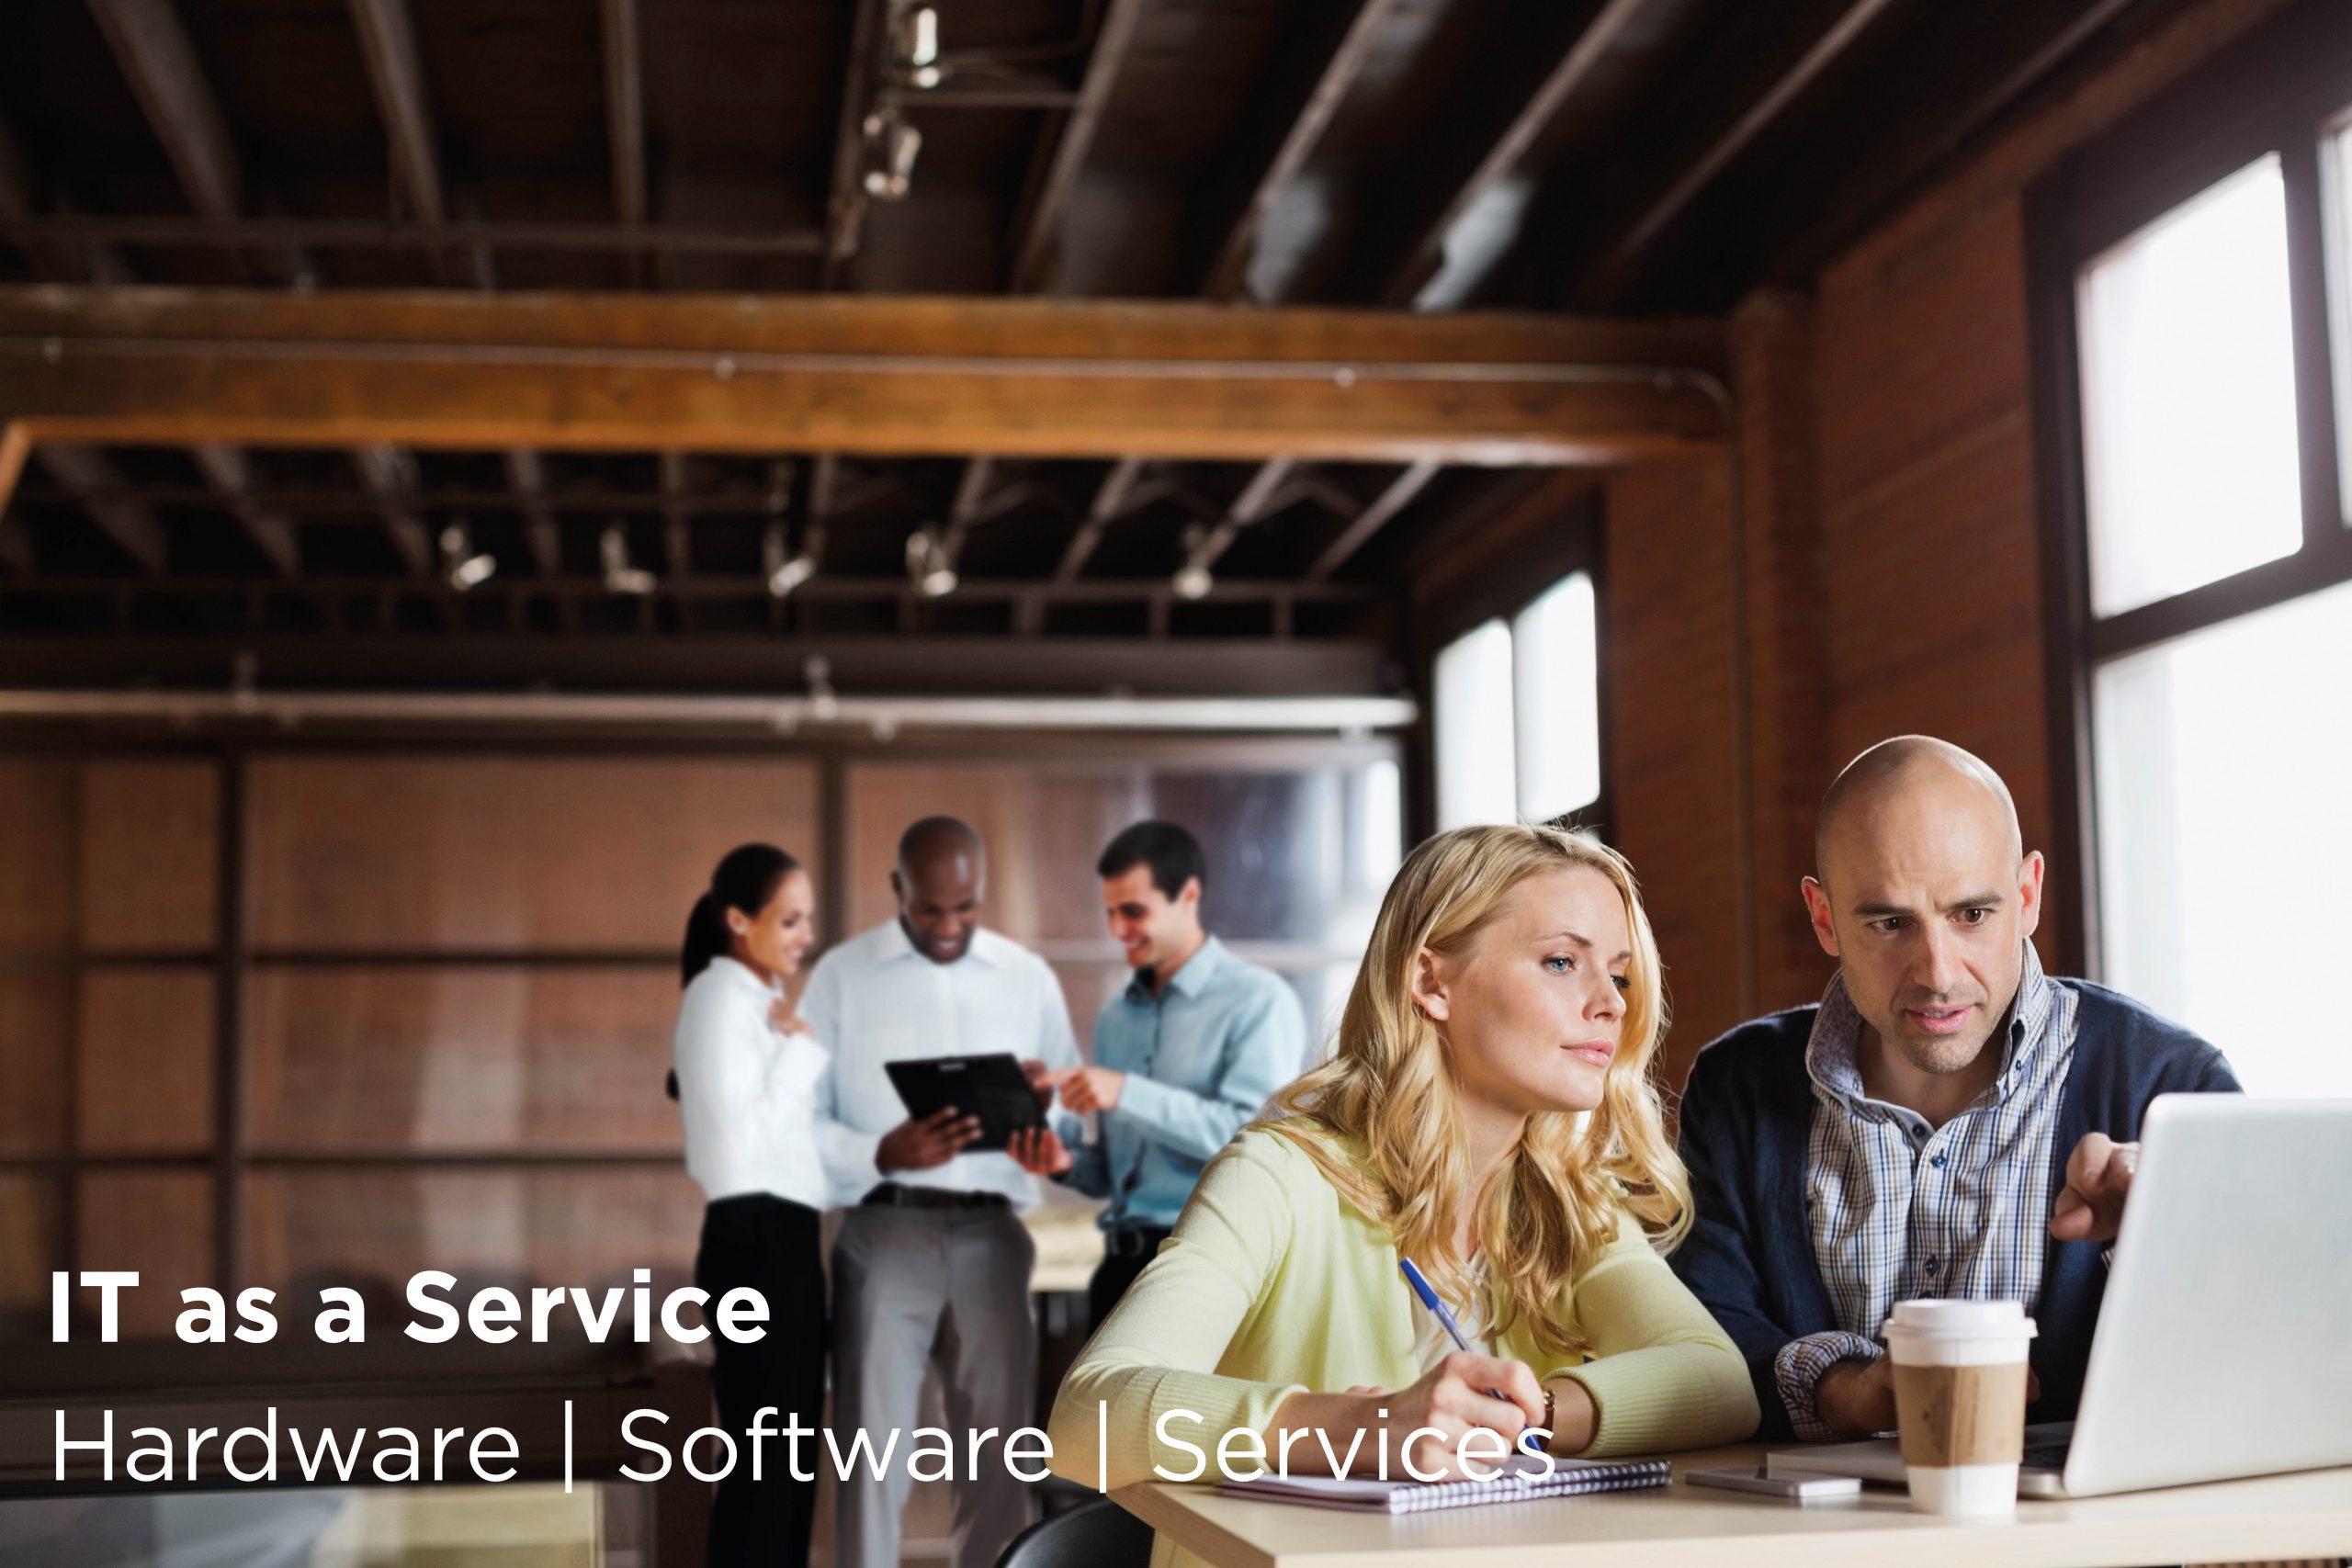 IT as a Service Konzept. Lassen Sie sich beraten!